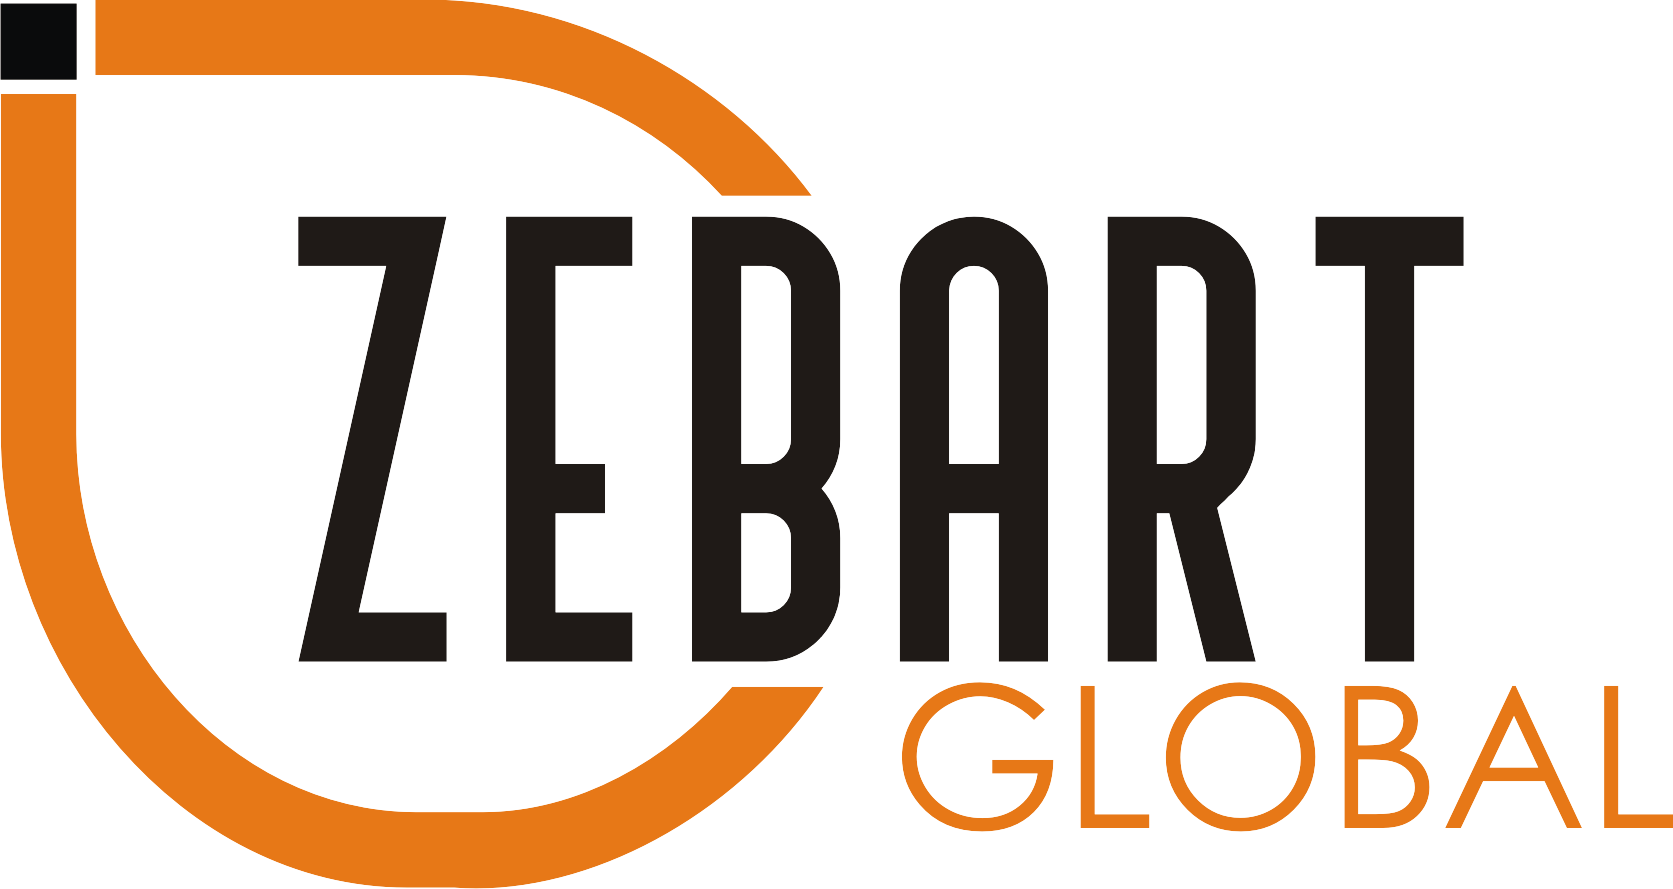 Zebart Global Limited